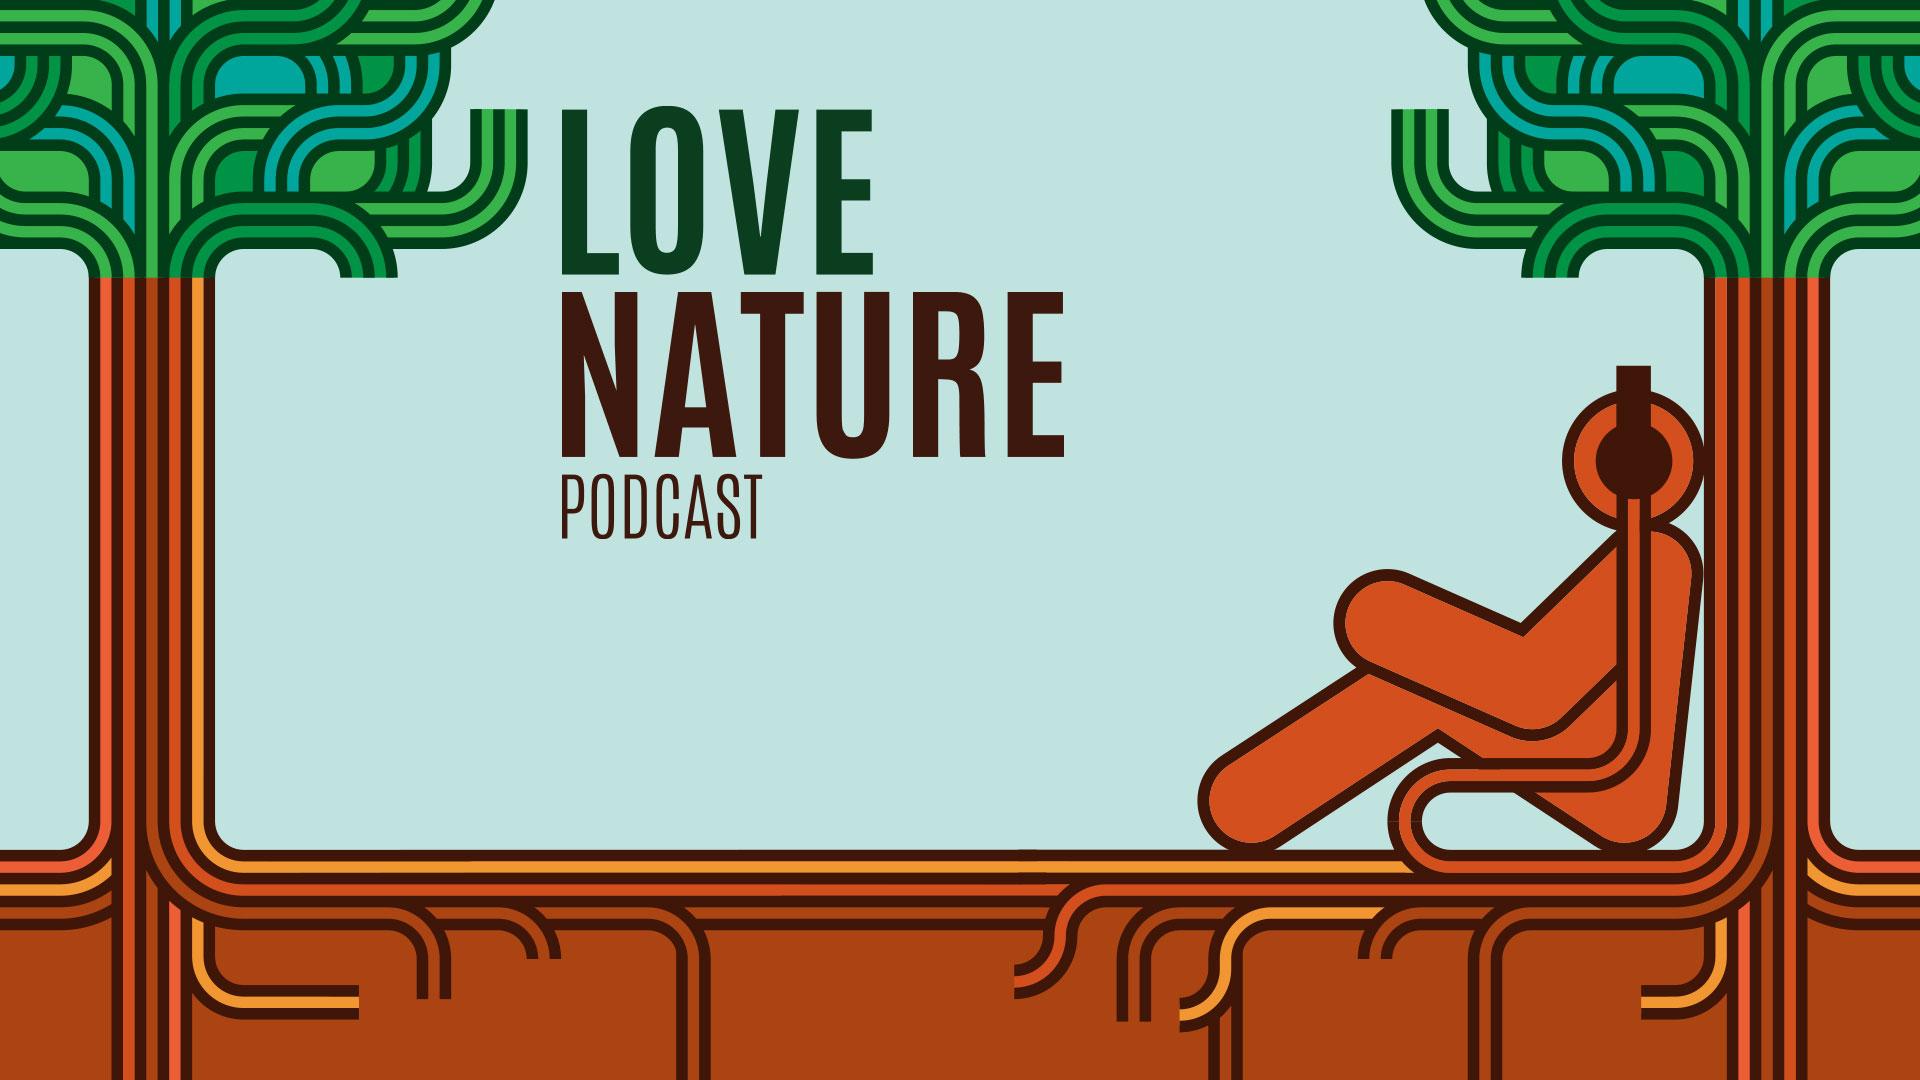 Love Nature Podcast